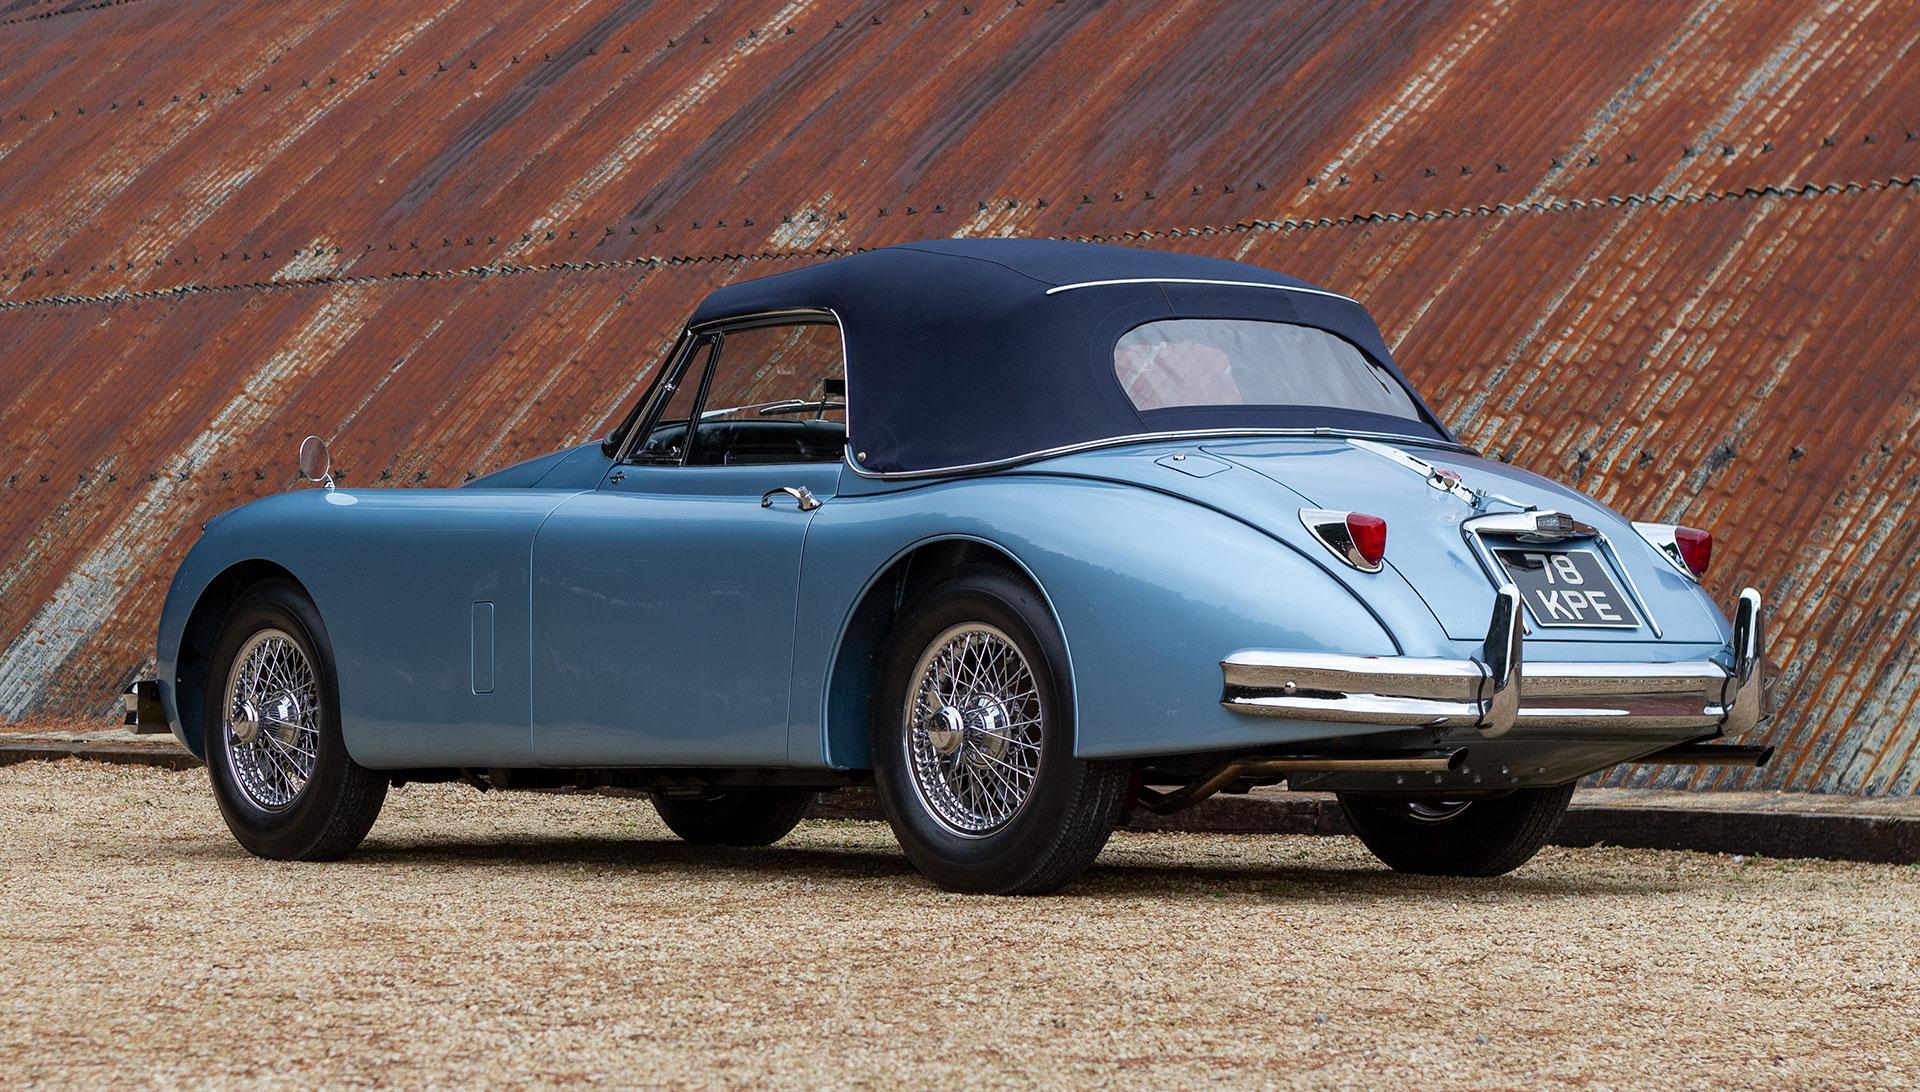 1959 Jaguar XK150 S 3.4 DHC for sale at The Classic Motor Hub